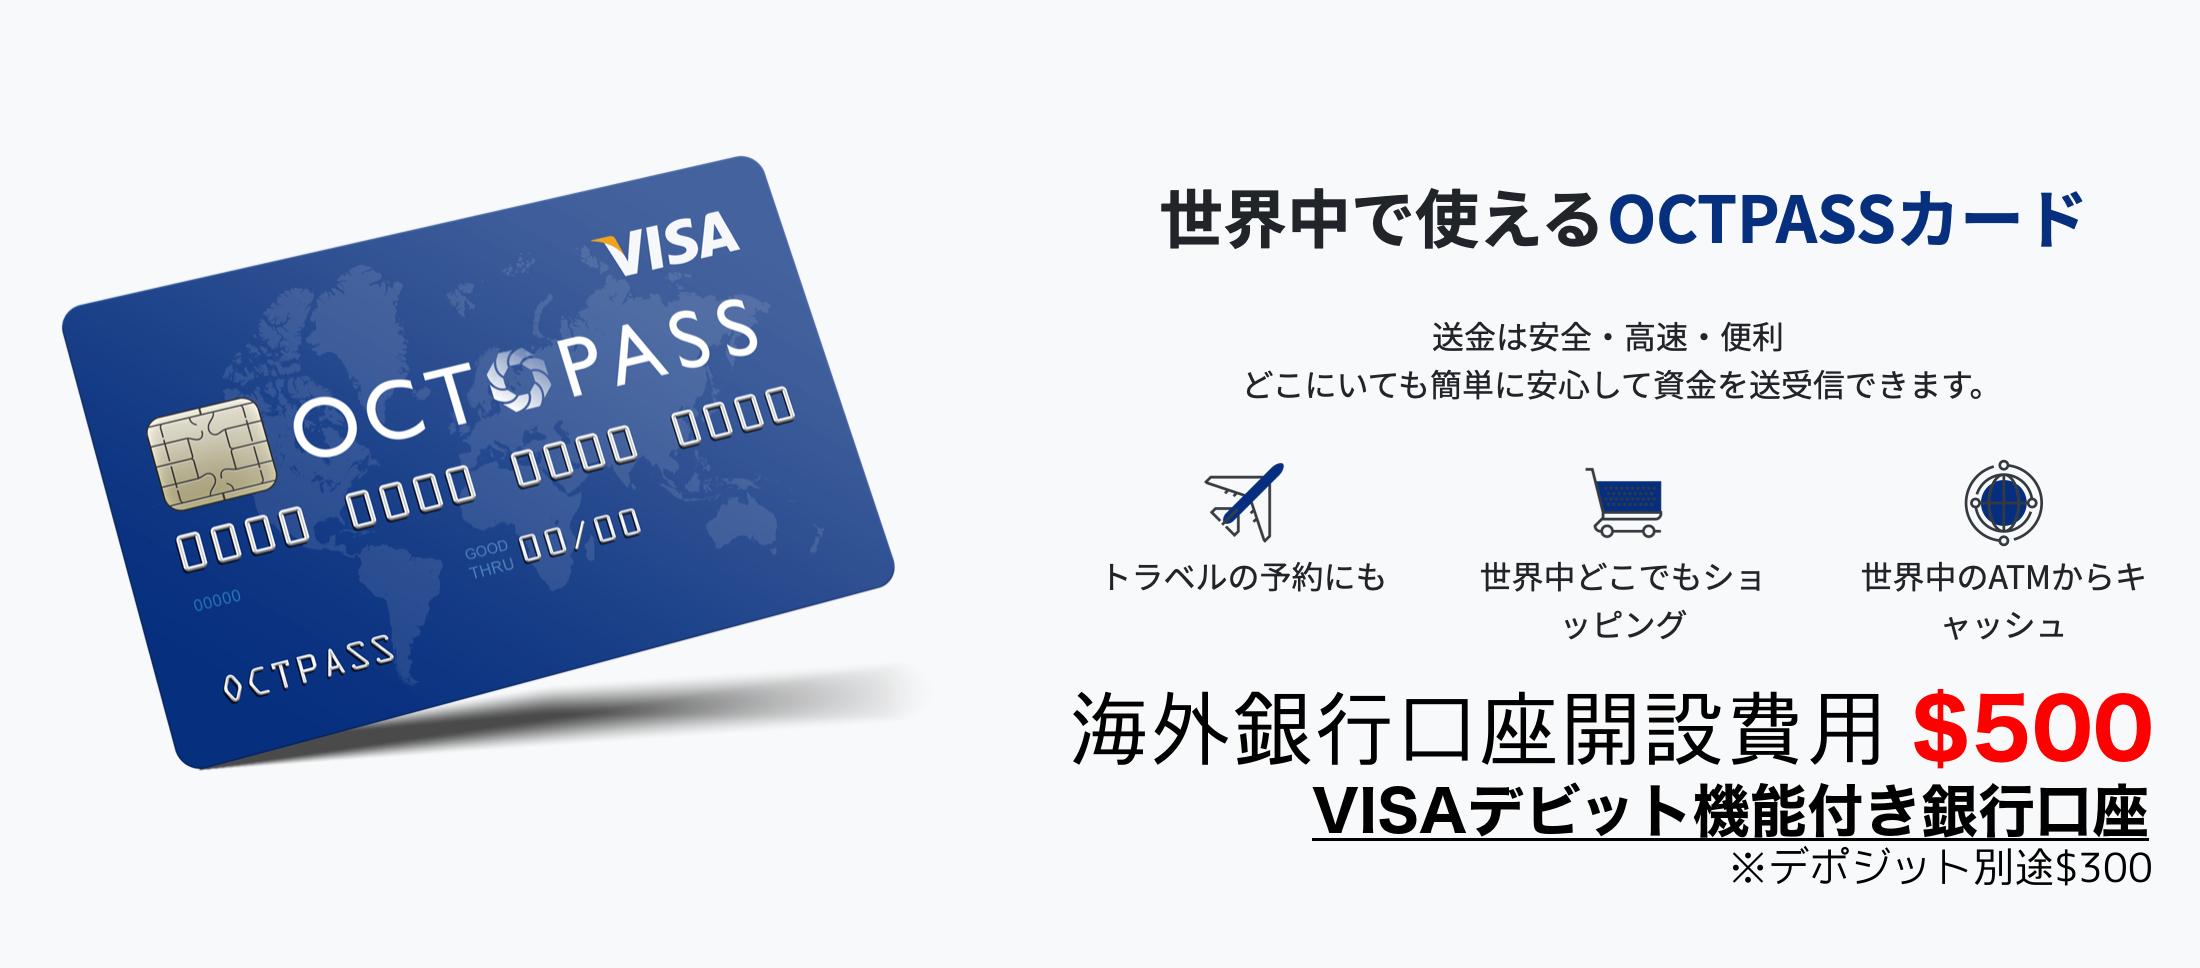 OCTPASSカード - 仮想通貨(暗号資産)のデビット機能付き海外銀行口座開設